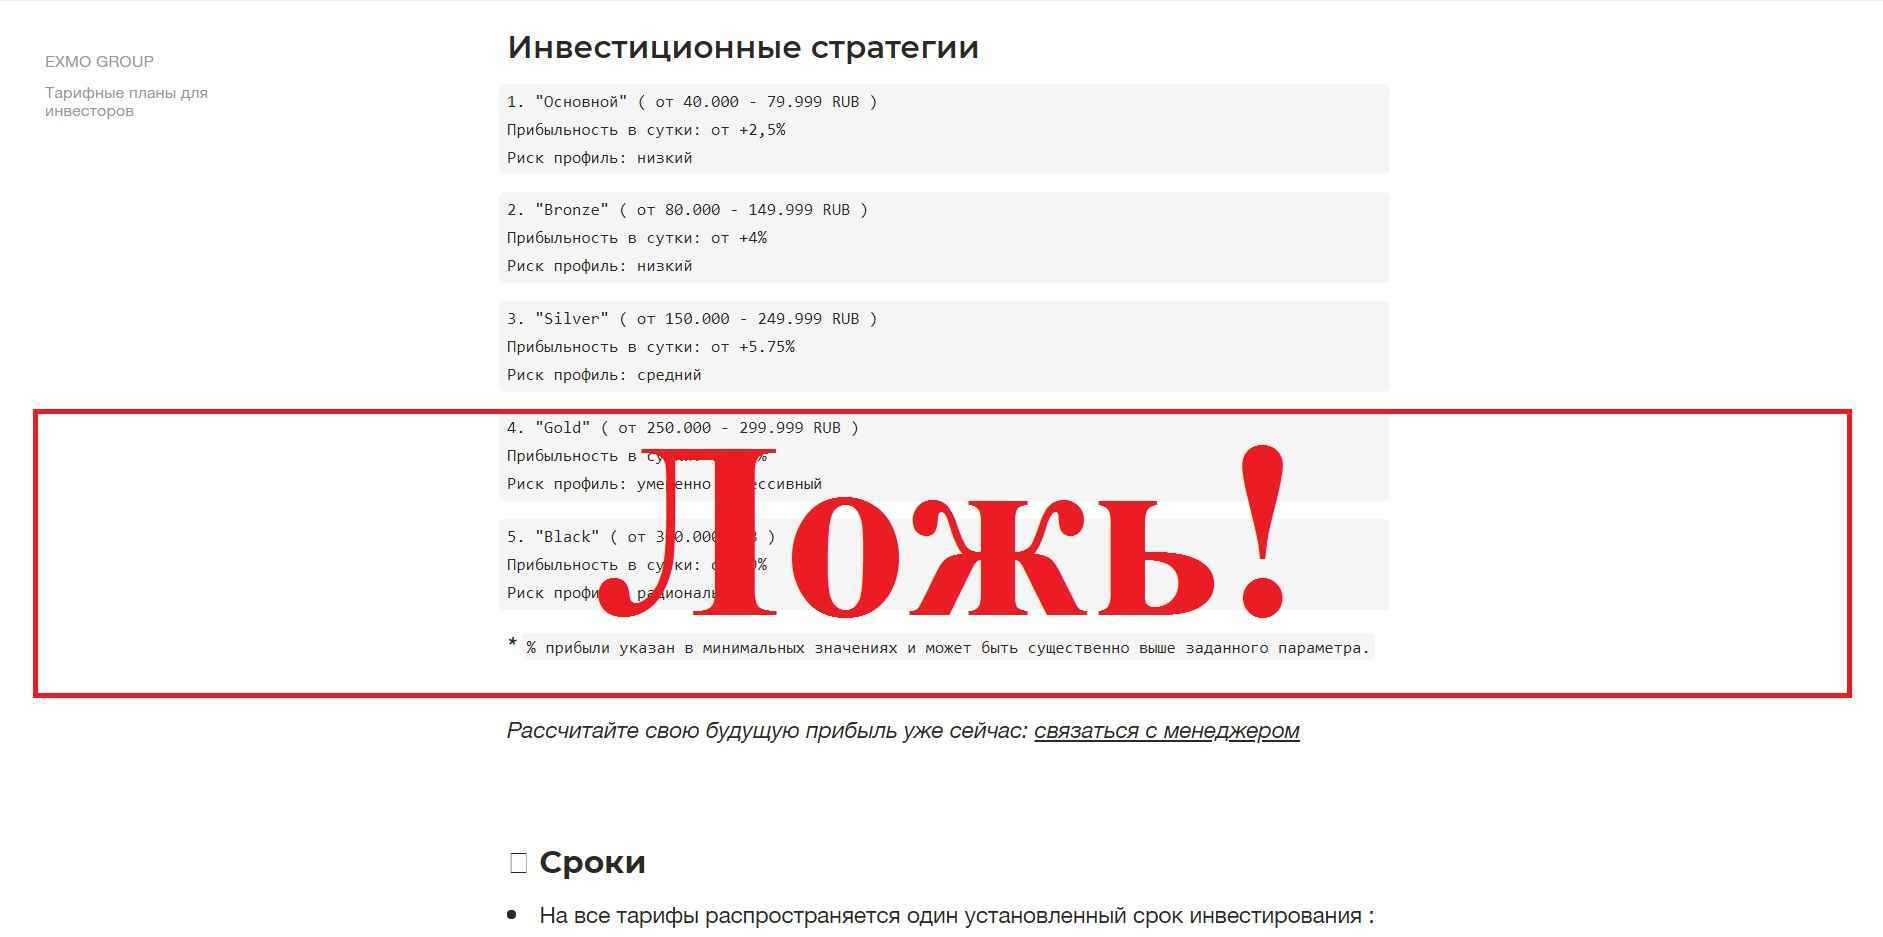 Exmo Group – отзывы о телеграм канале